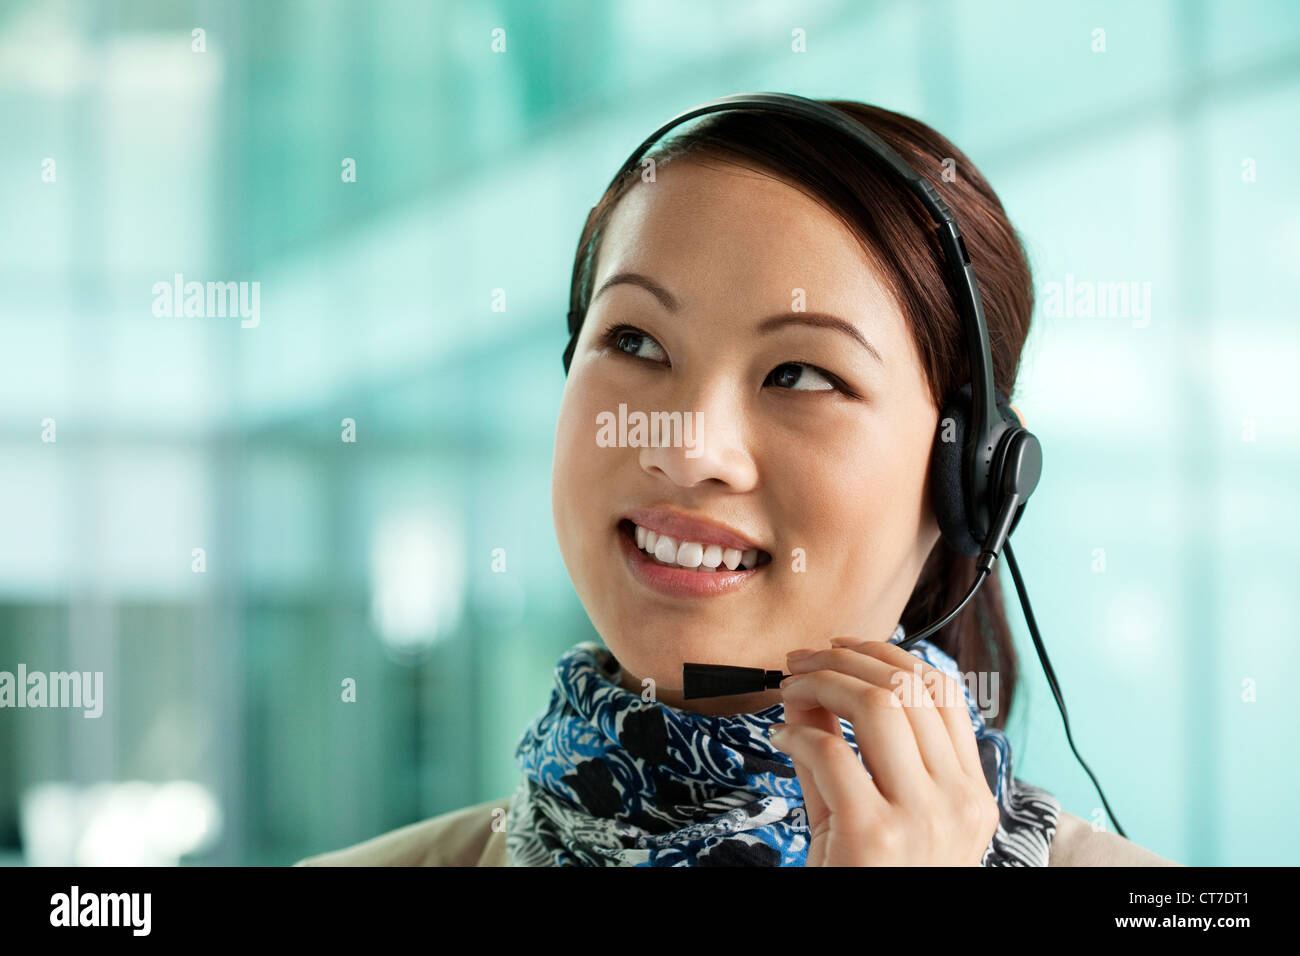 Office worker wearing headset - Stock Image